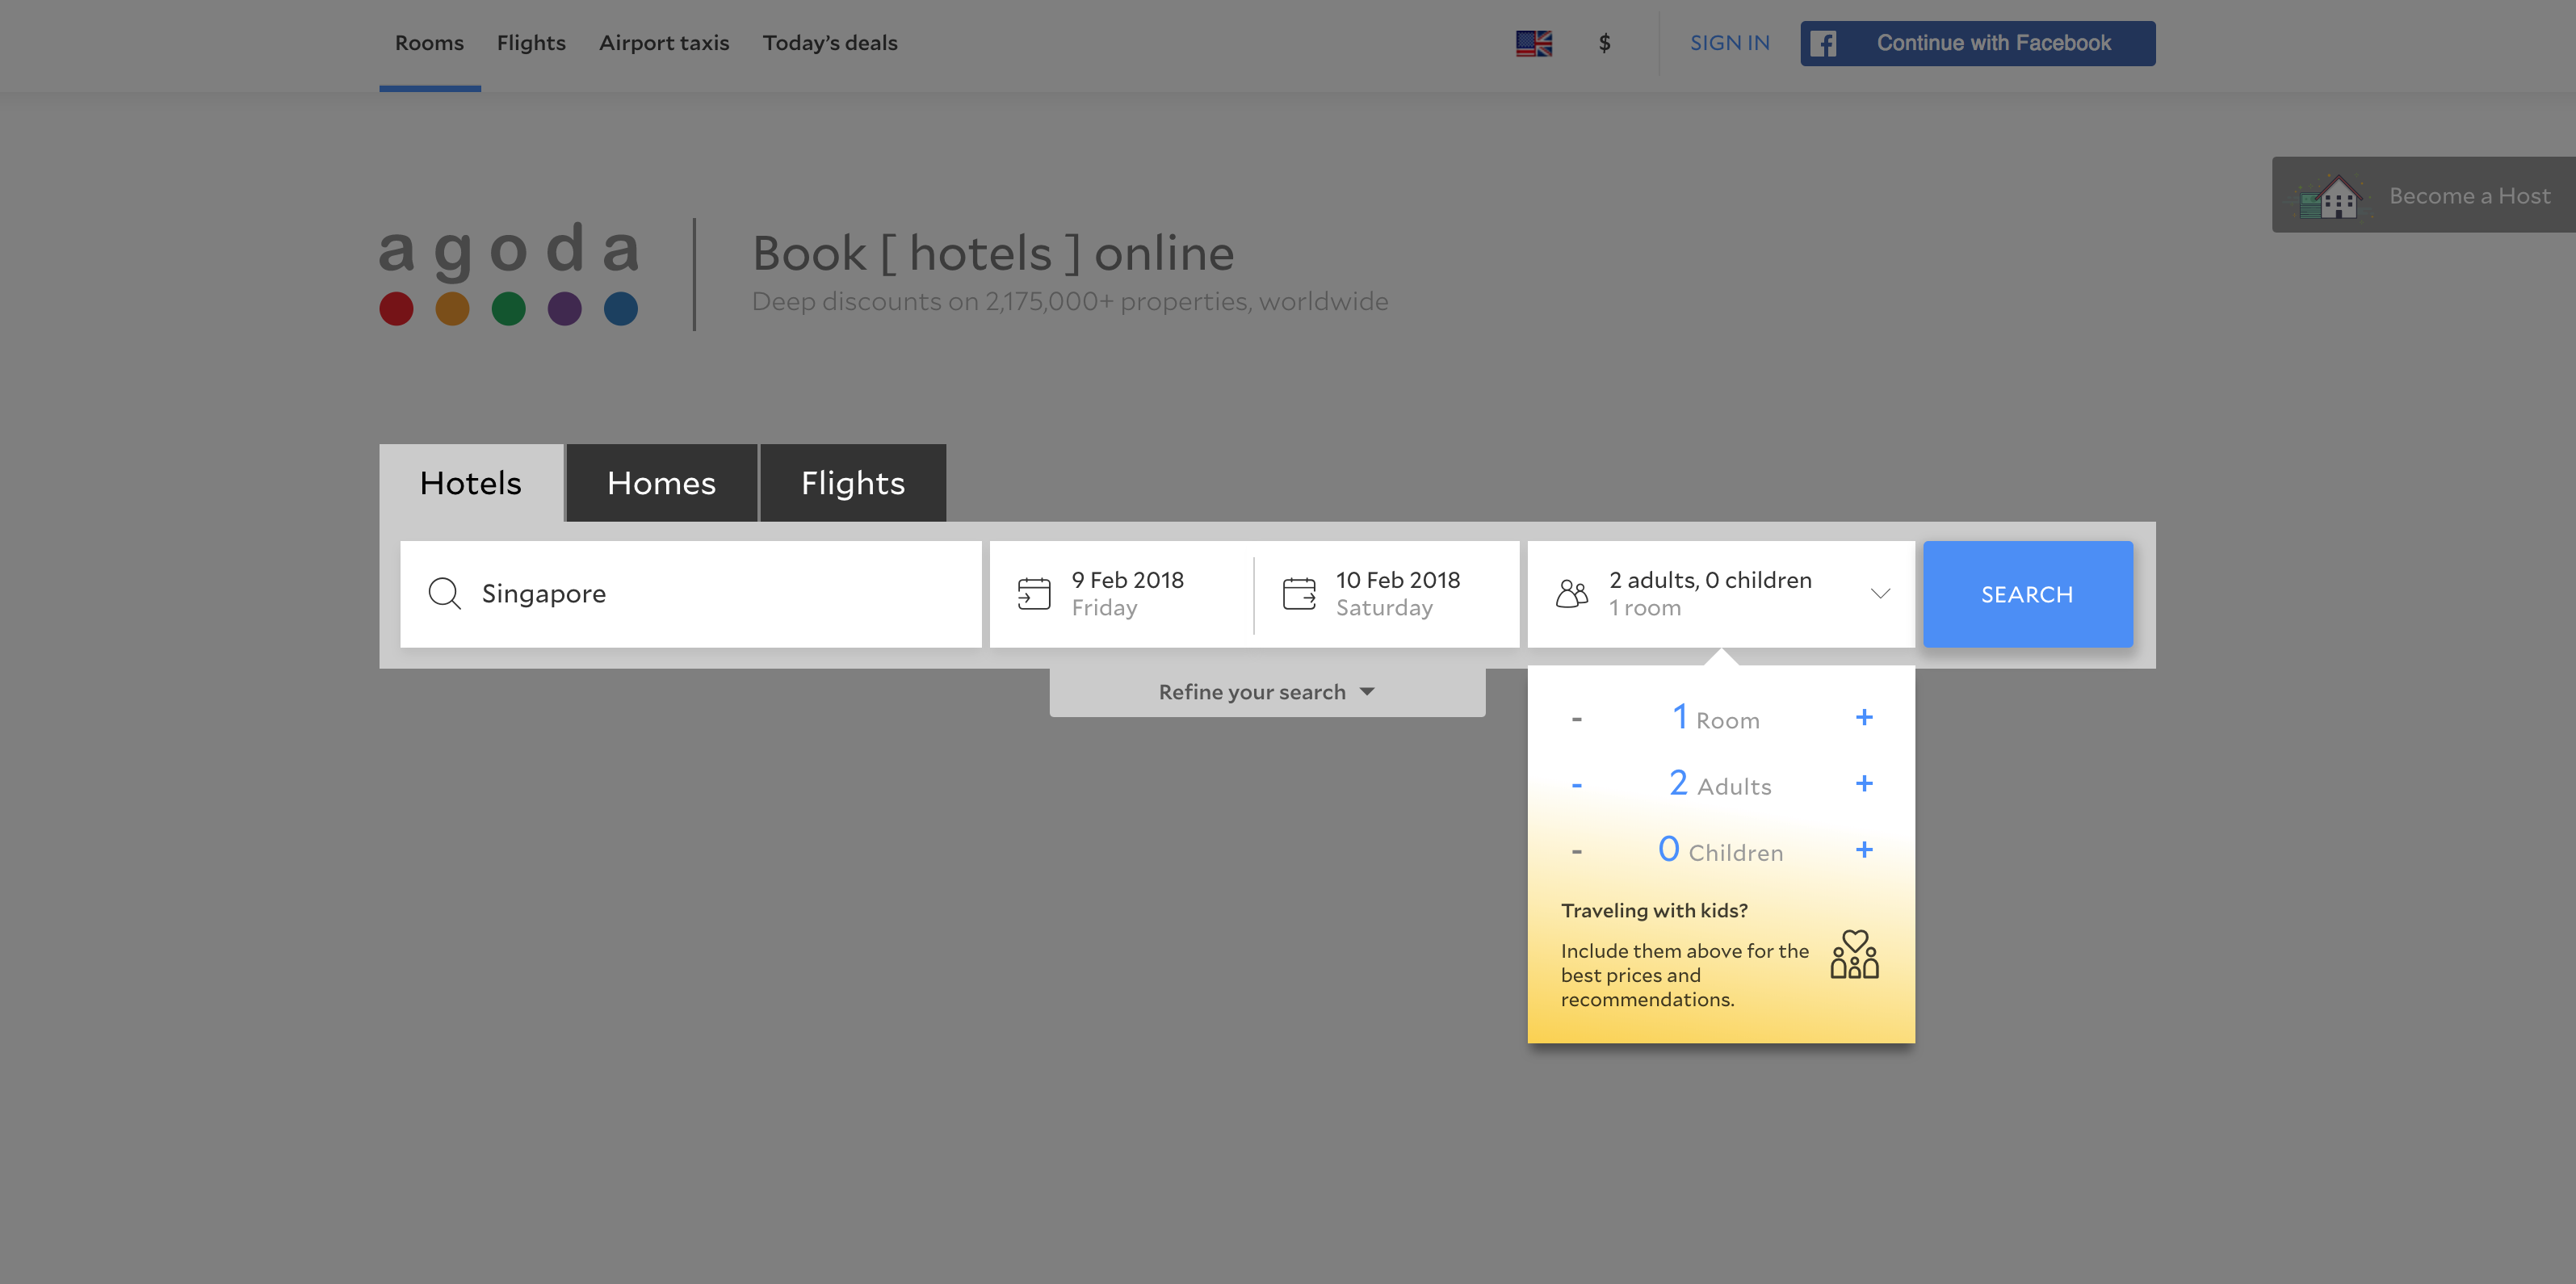 Agoda webpage inserting details